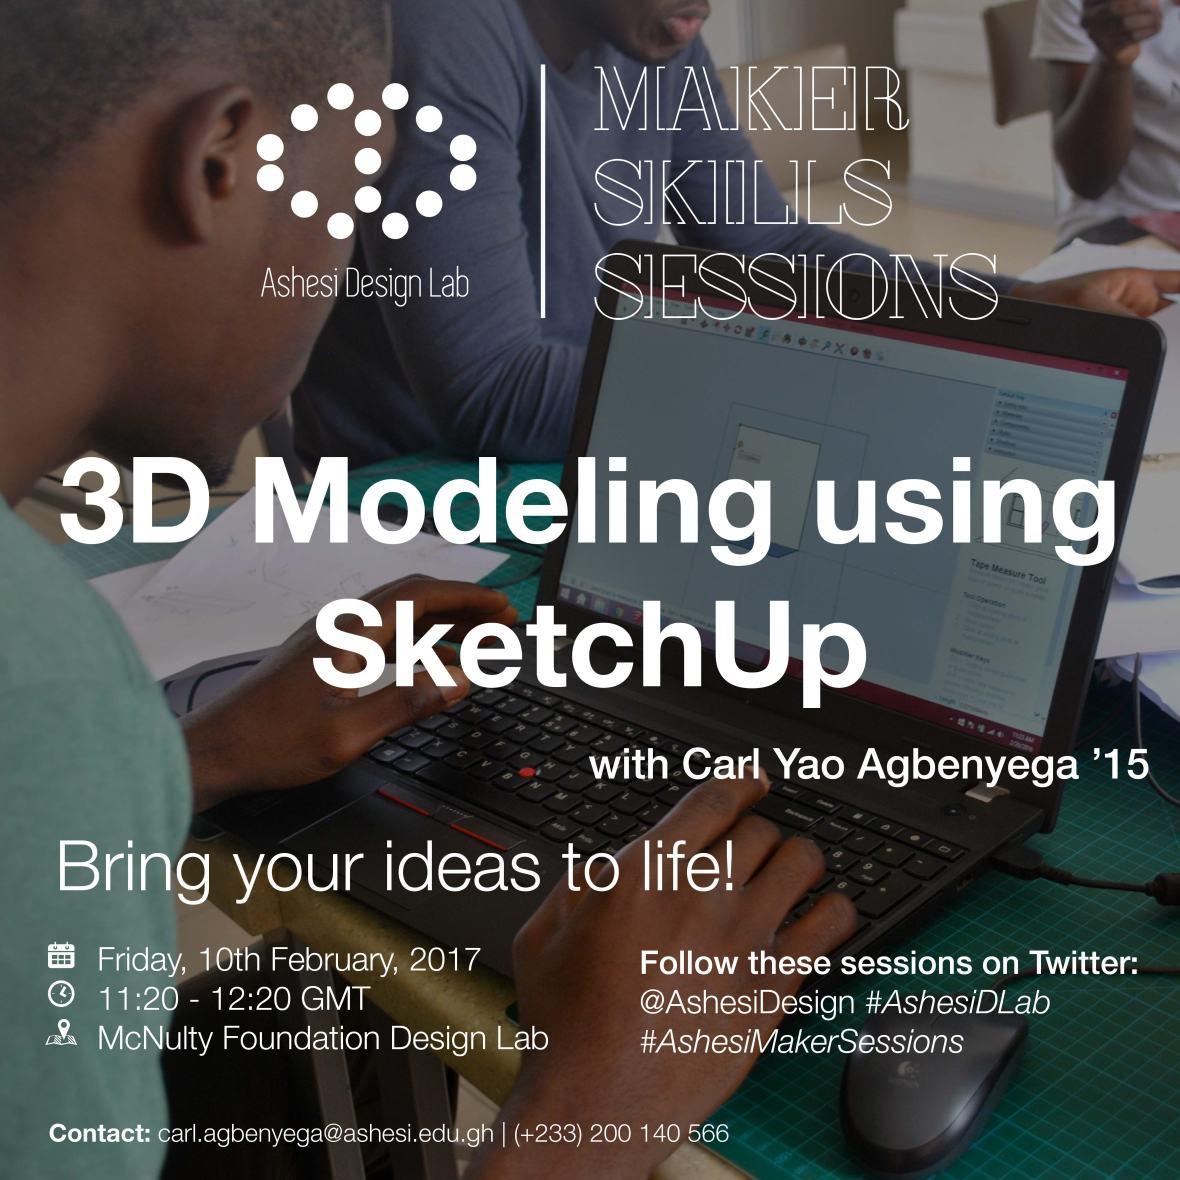 ashesi-dlab-maker-skills-sessions-3d-modeling-with-sketchup-01